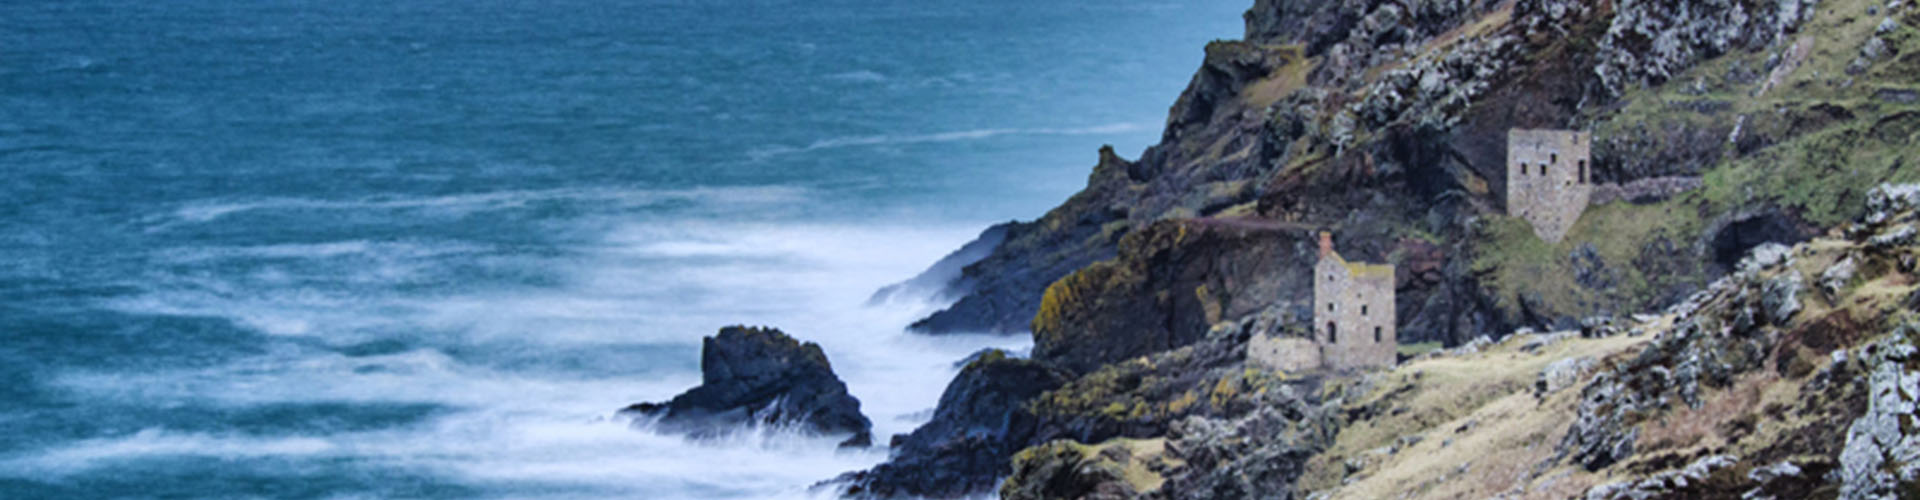 Botallack-mine-rough-sea-cornwall